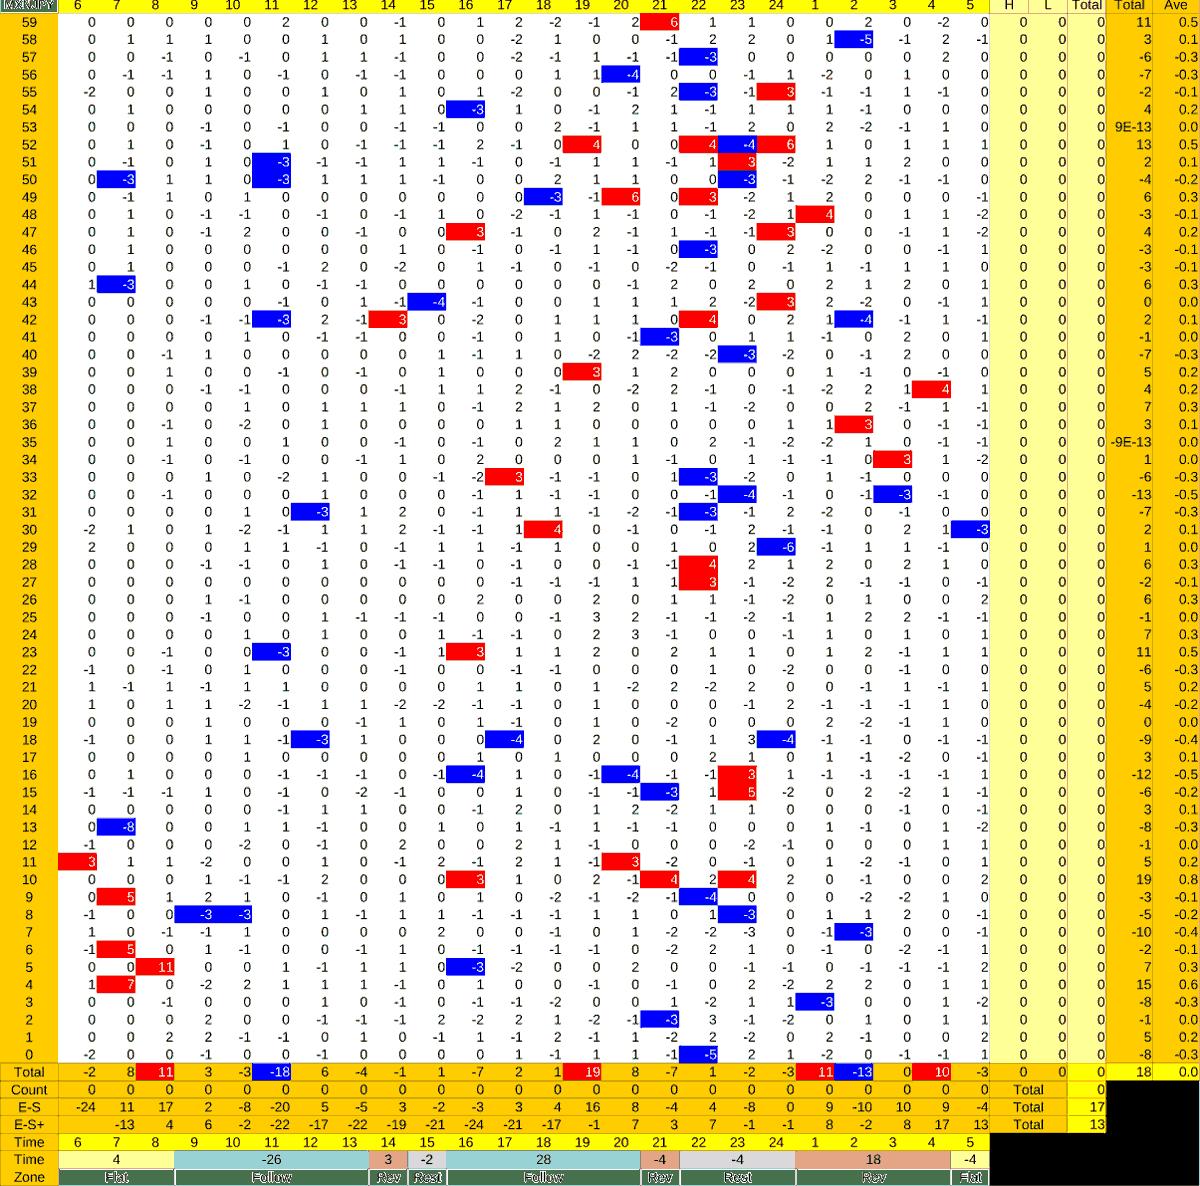 20210302_HS(3)MXNJPY